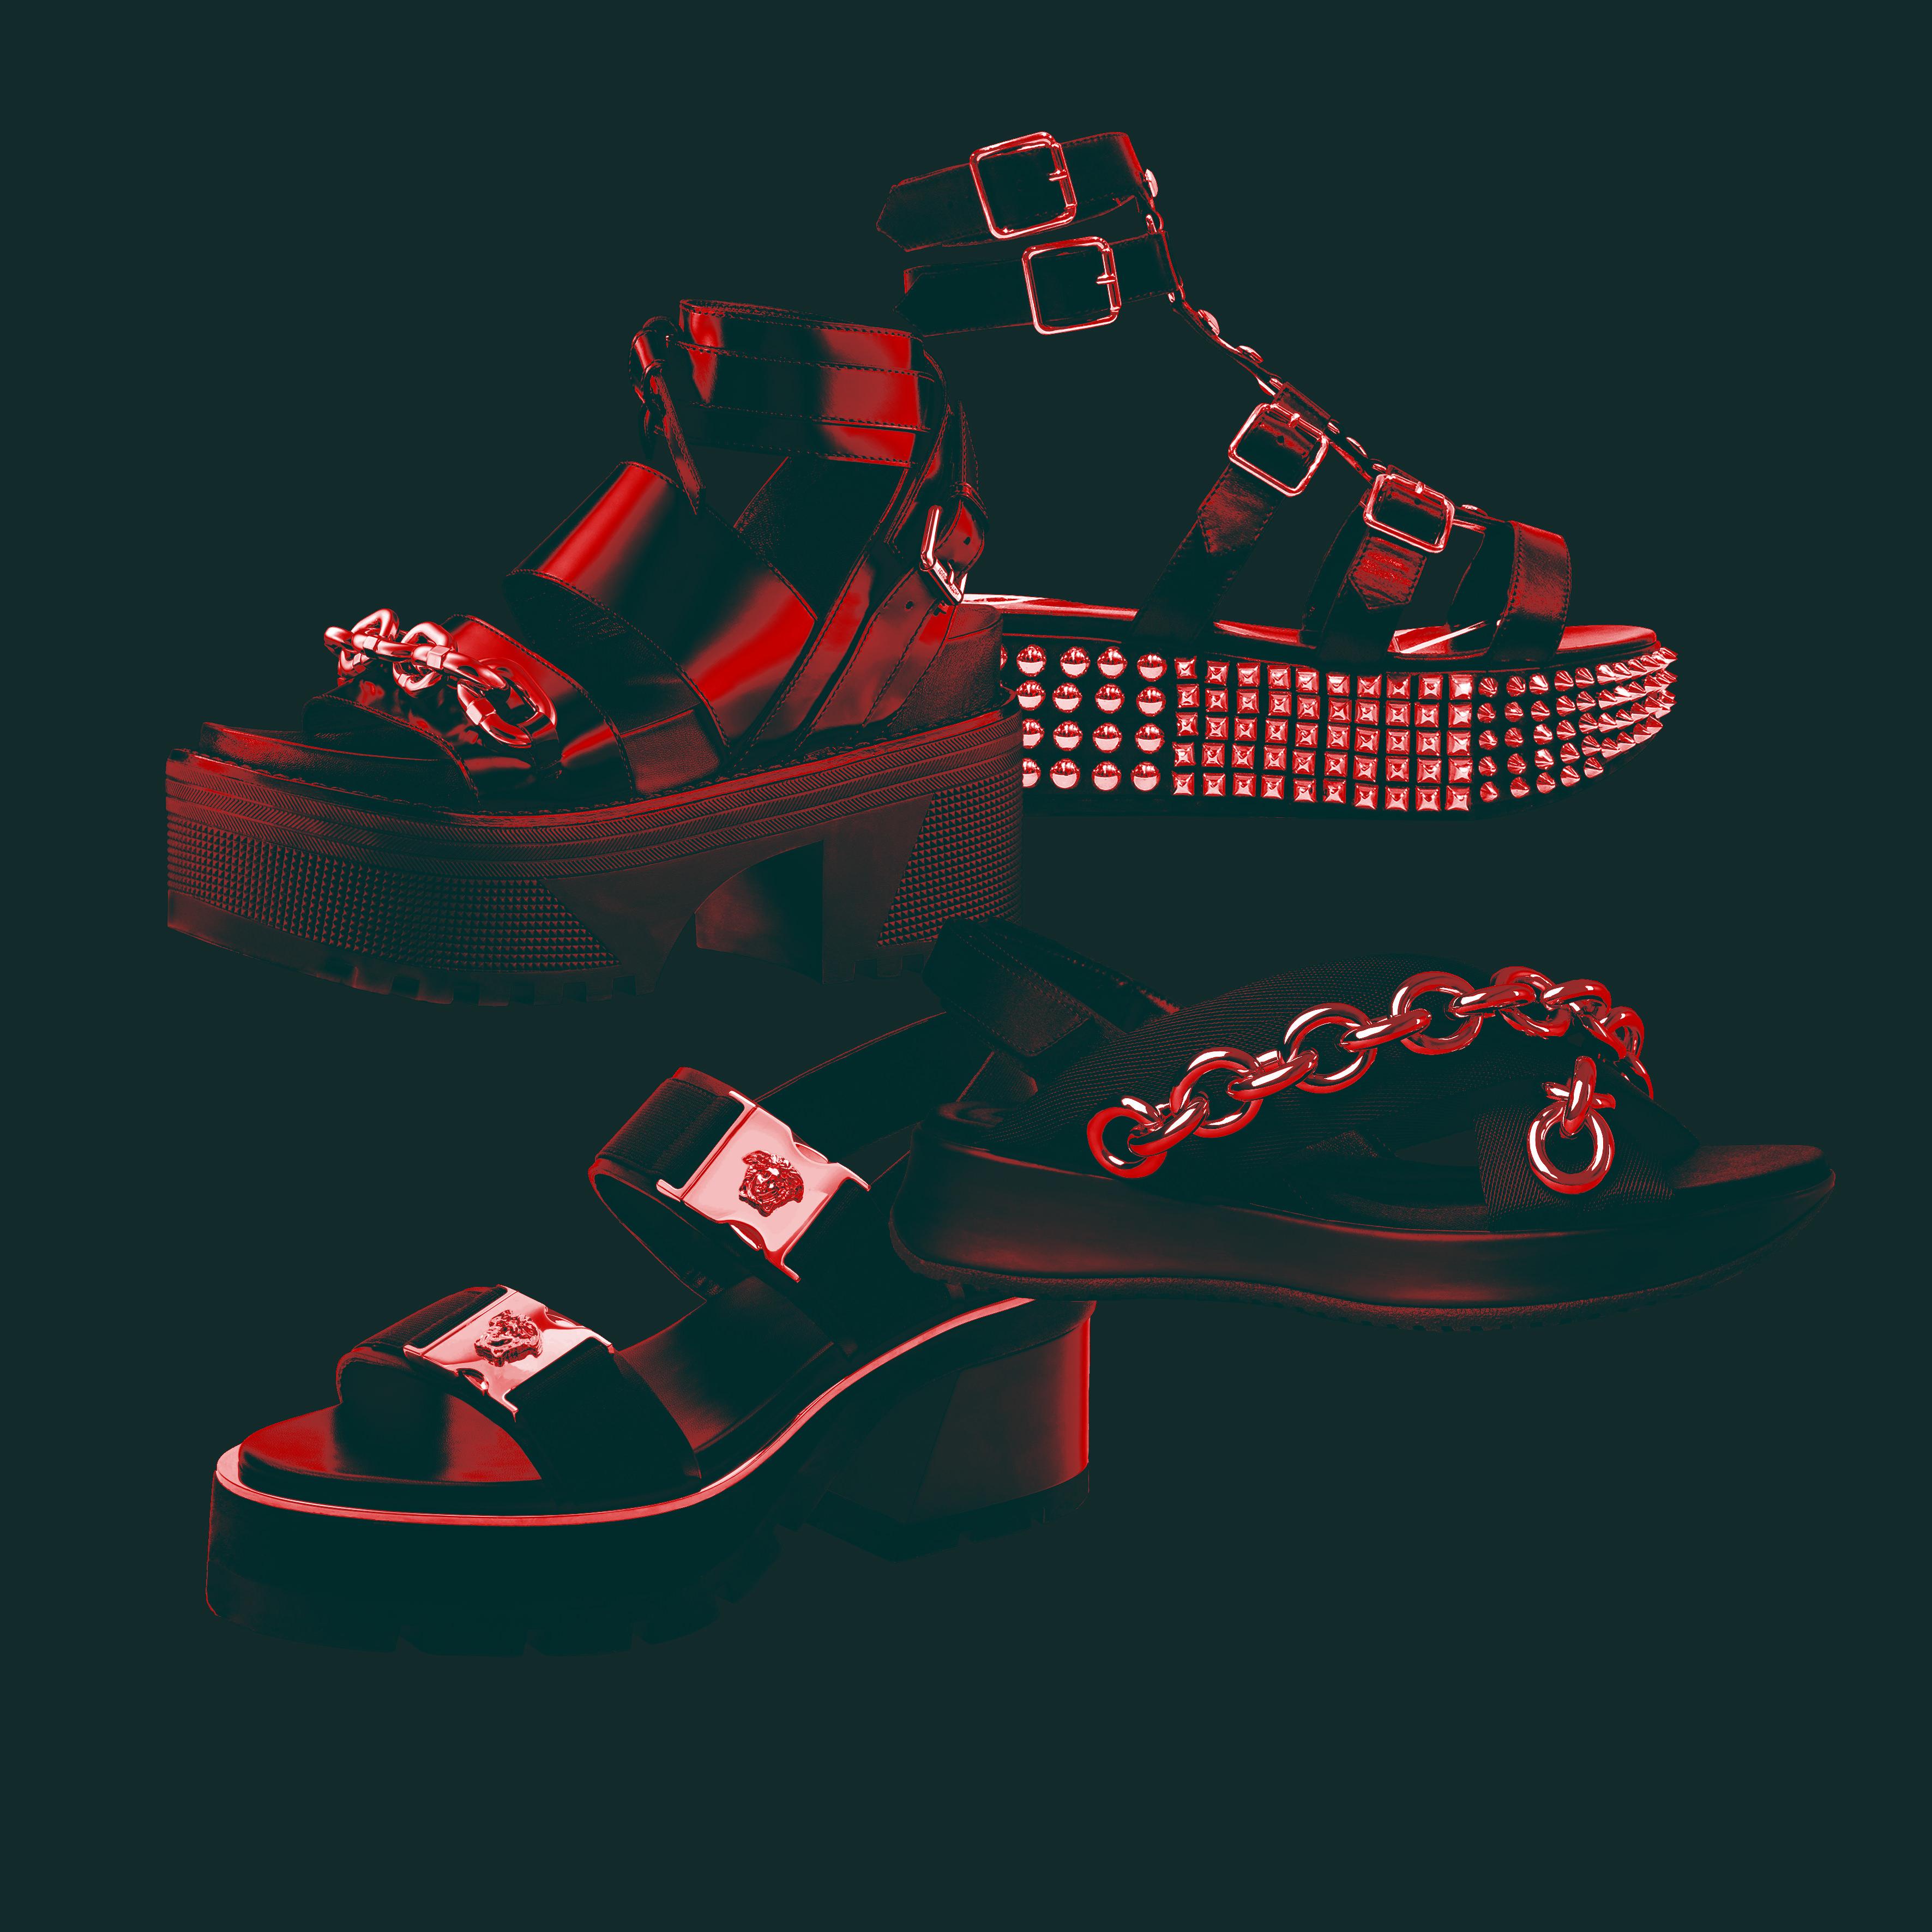 Burberry, Louis Vuitton, Philipp Plein and Versace's punk sandals